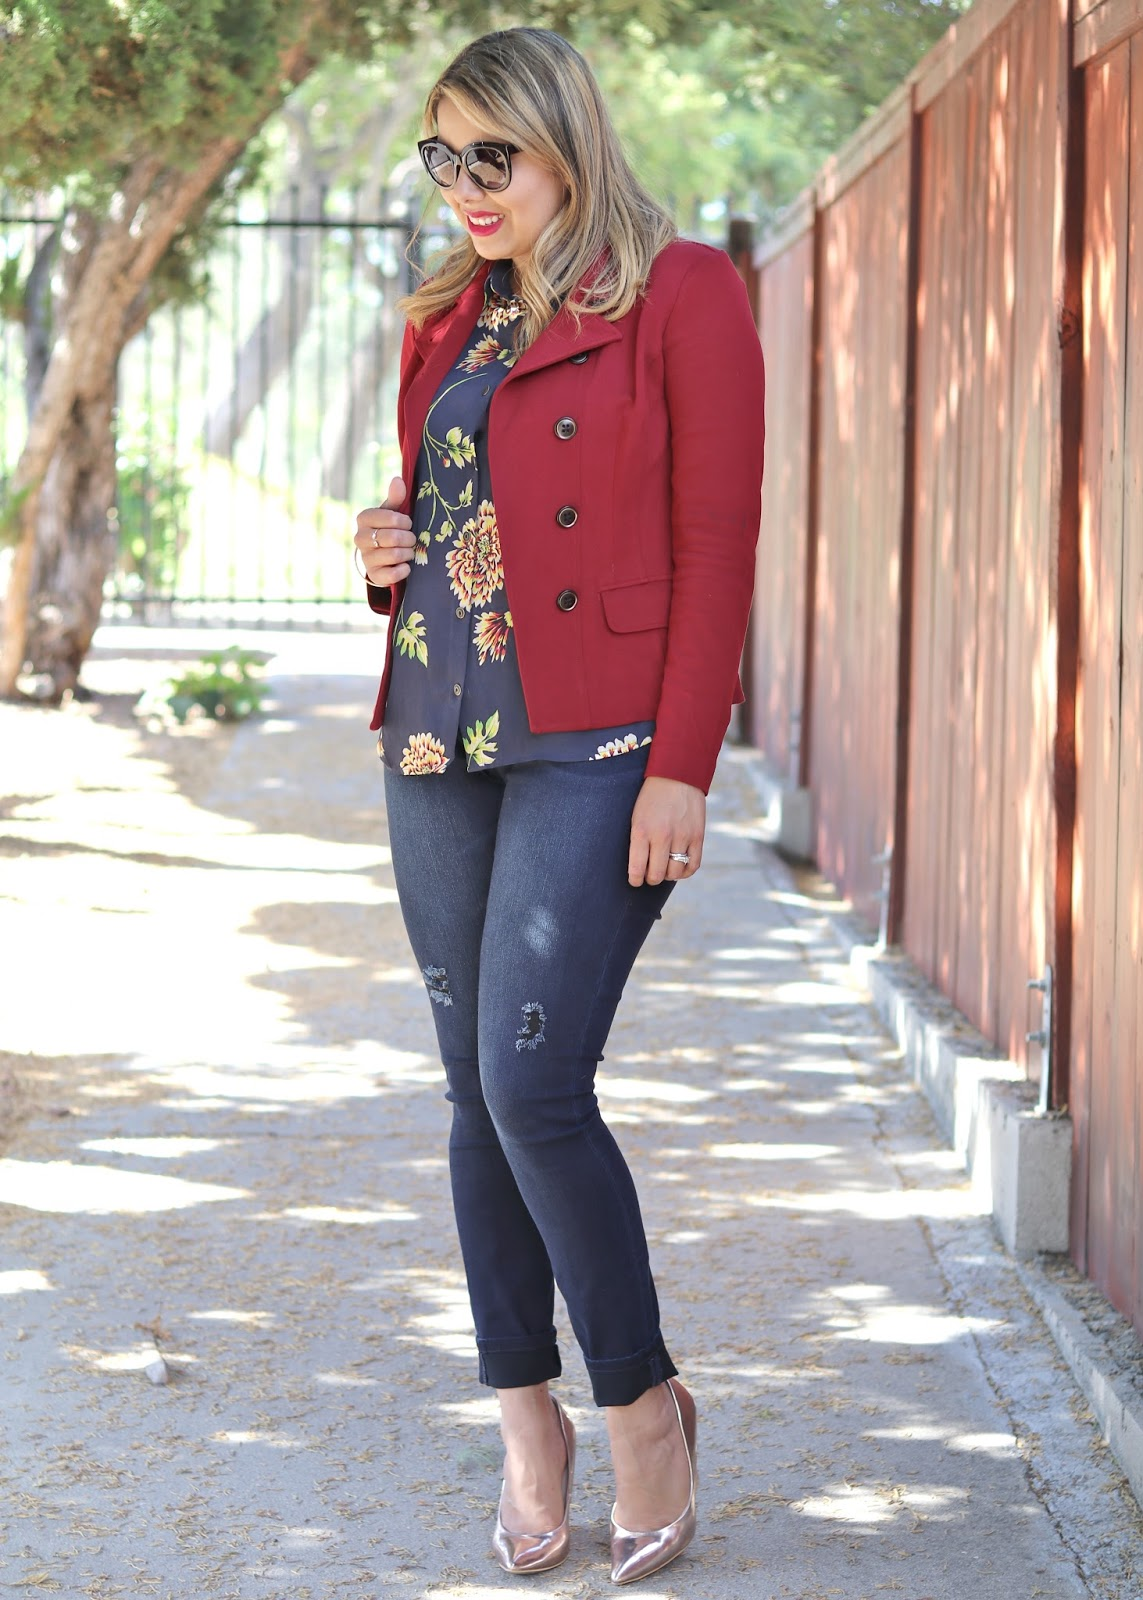 Fall 2016 Outfit, San Diego Fashion Blogger, San Diego Fashion, San Diego Style Blogger